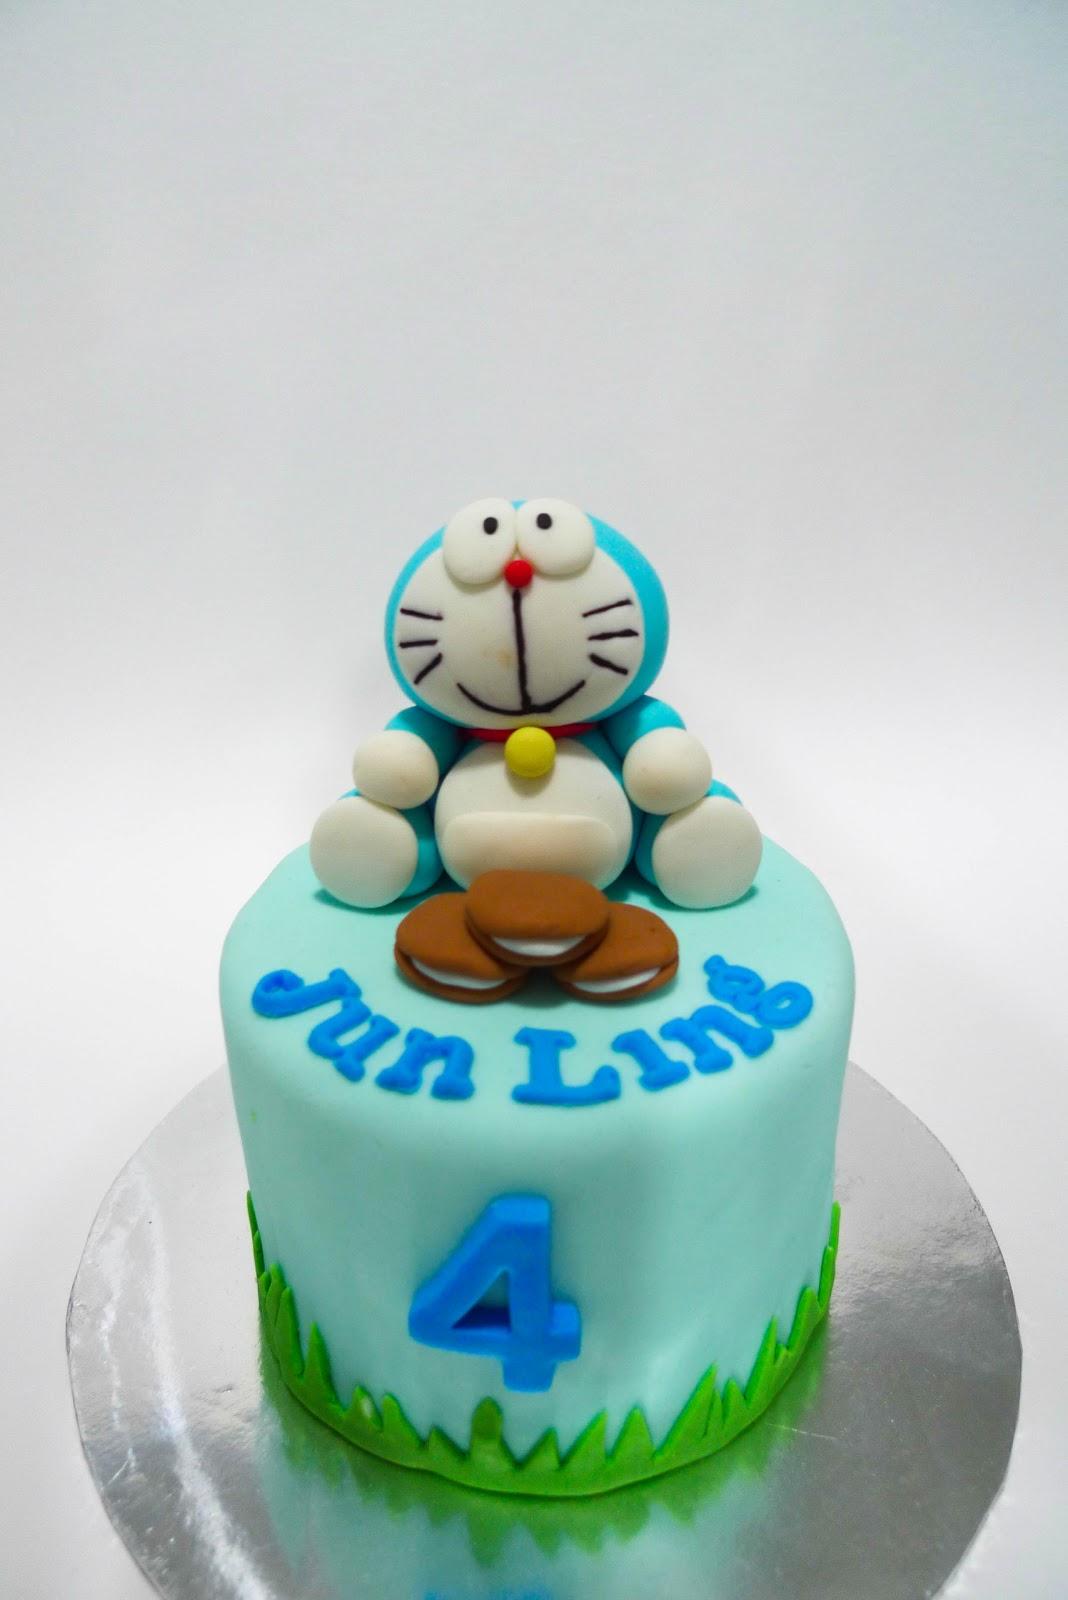 Birthday Cake Images Of Doraemon ~ Sweet clay doraemon